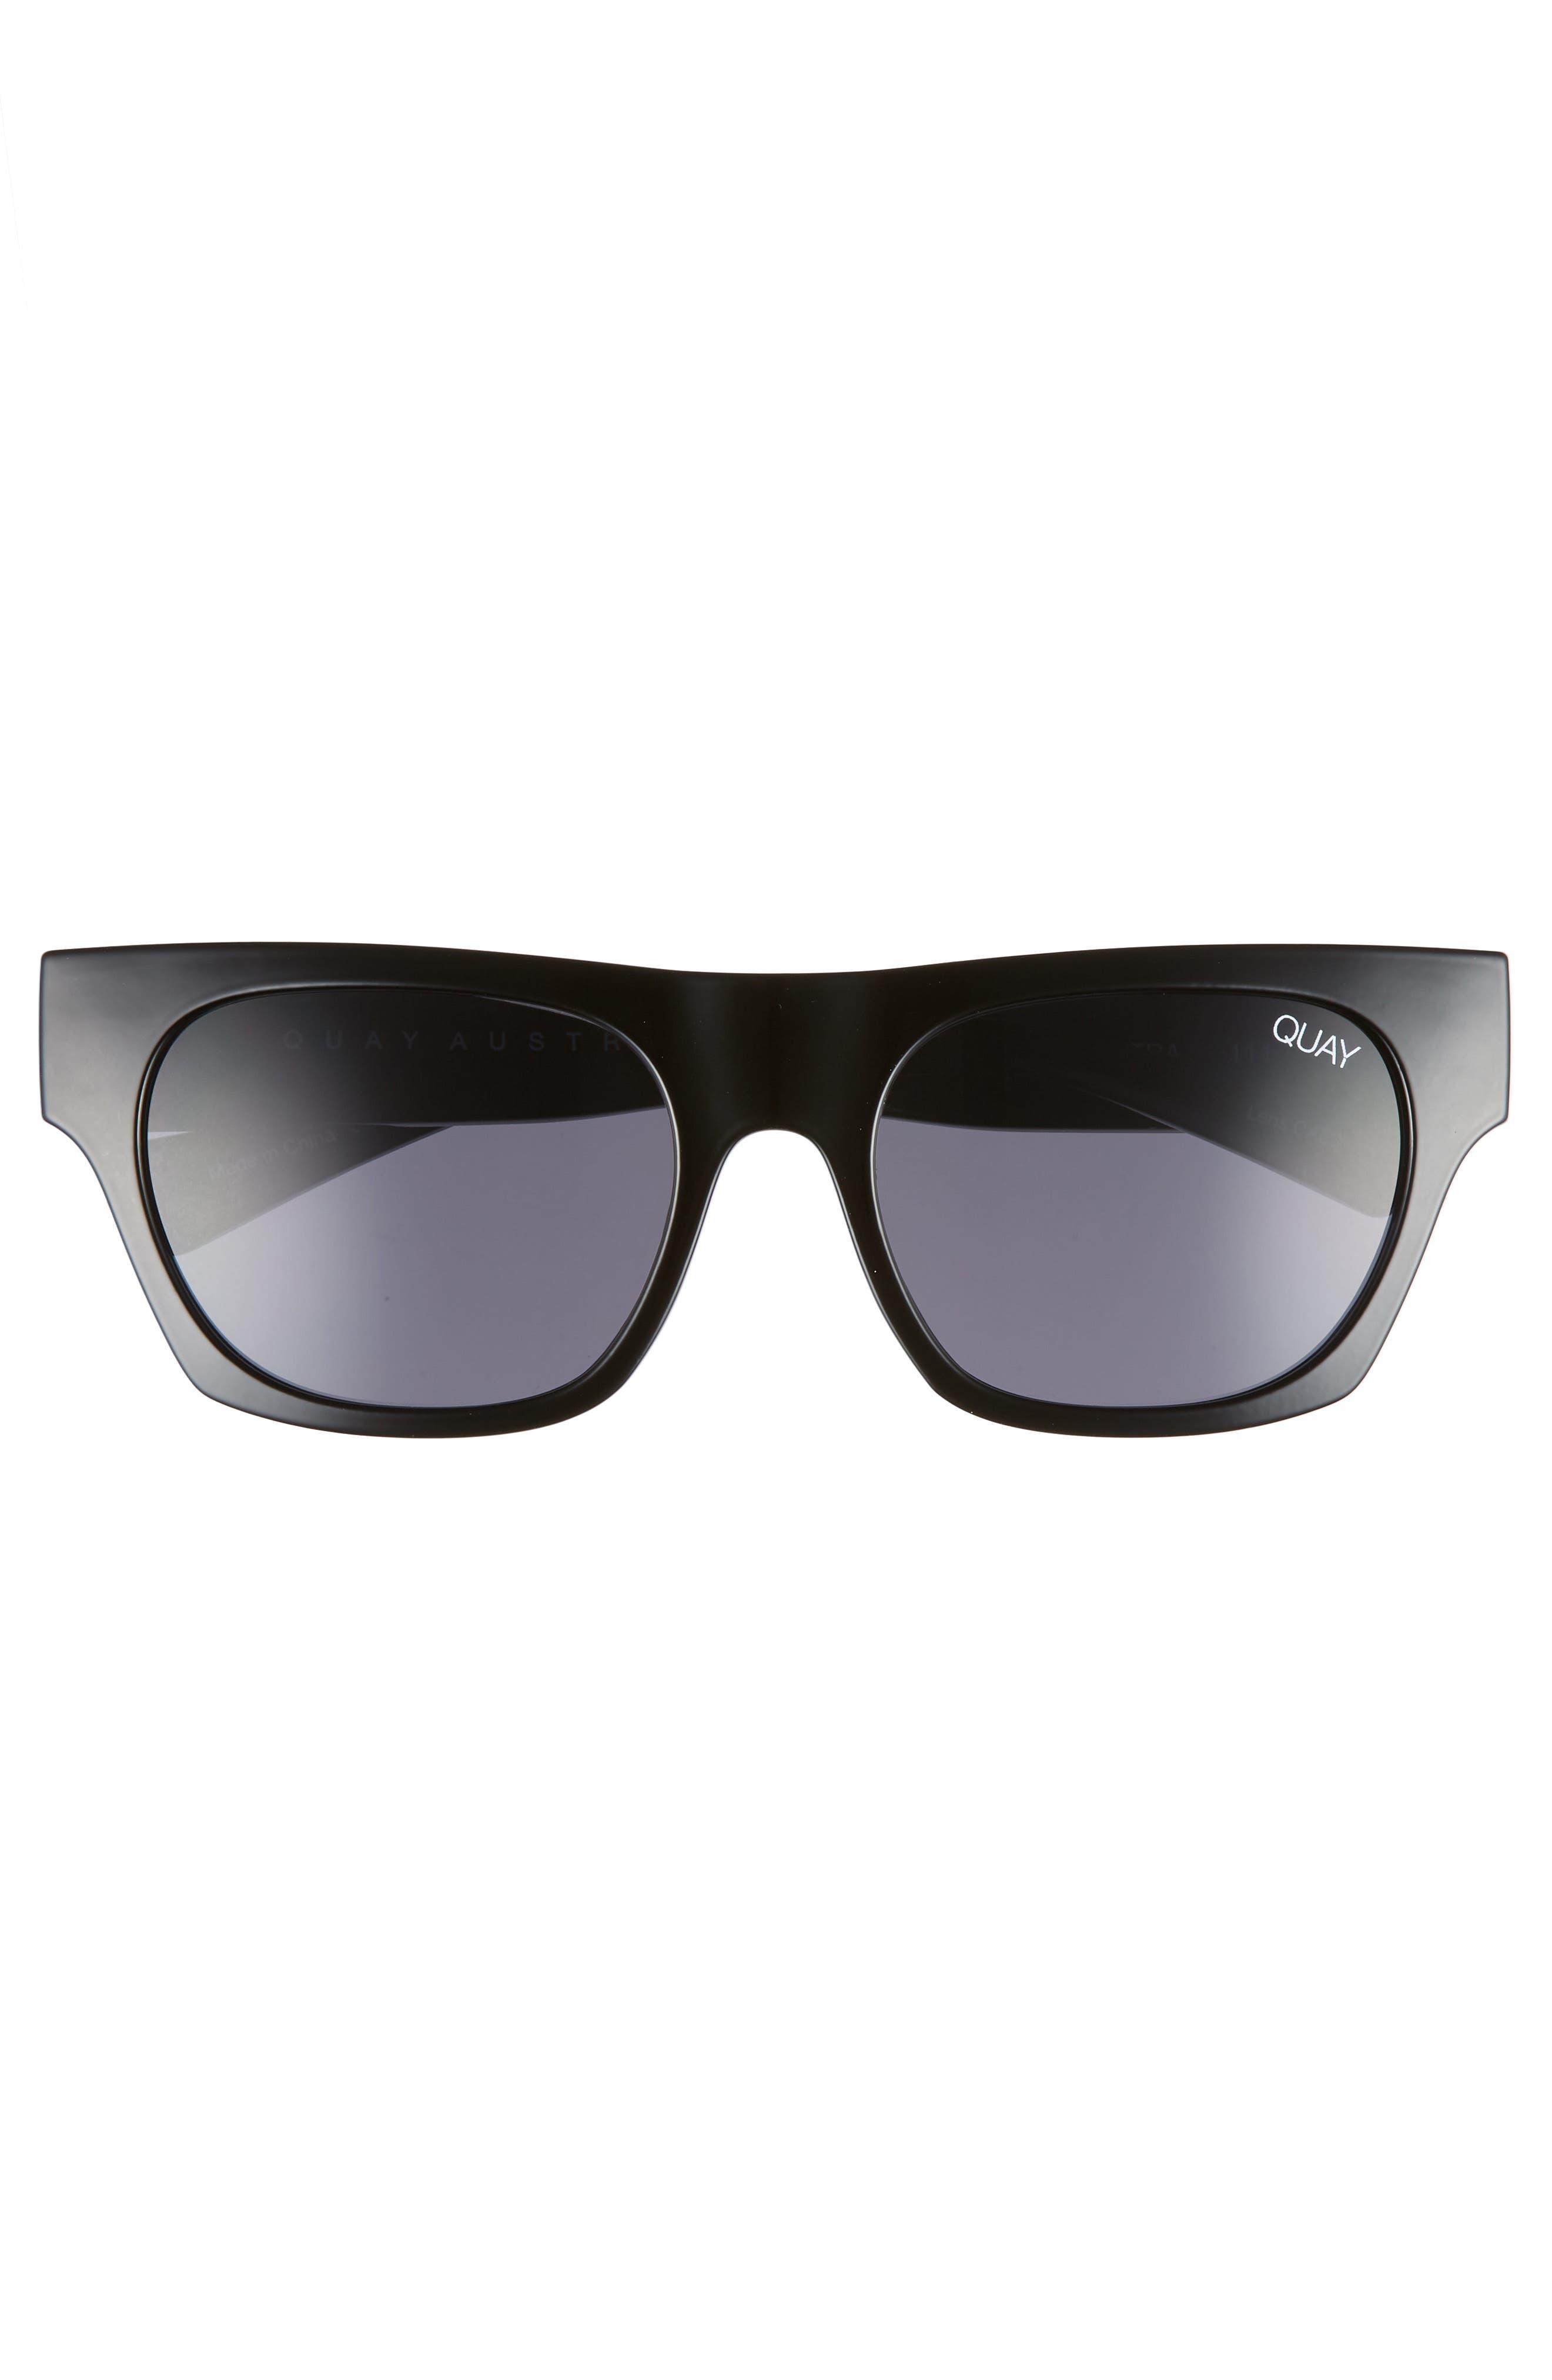 Something Extra 53mm Square Sunglasses,                             Alternate thumbnail 3, color,                             001